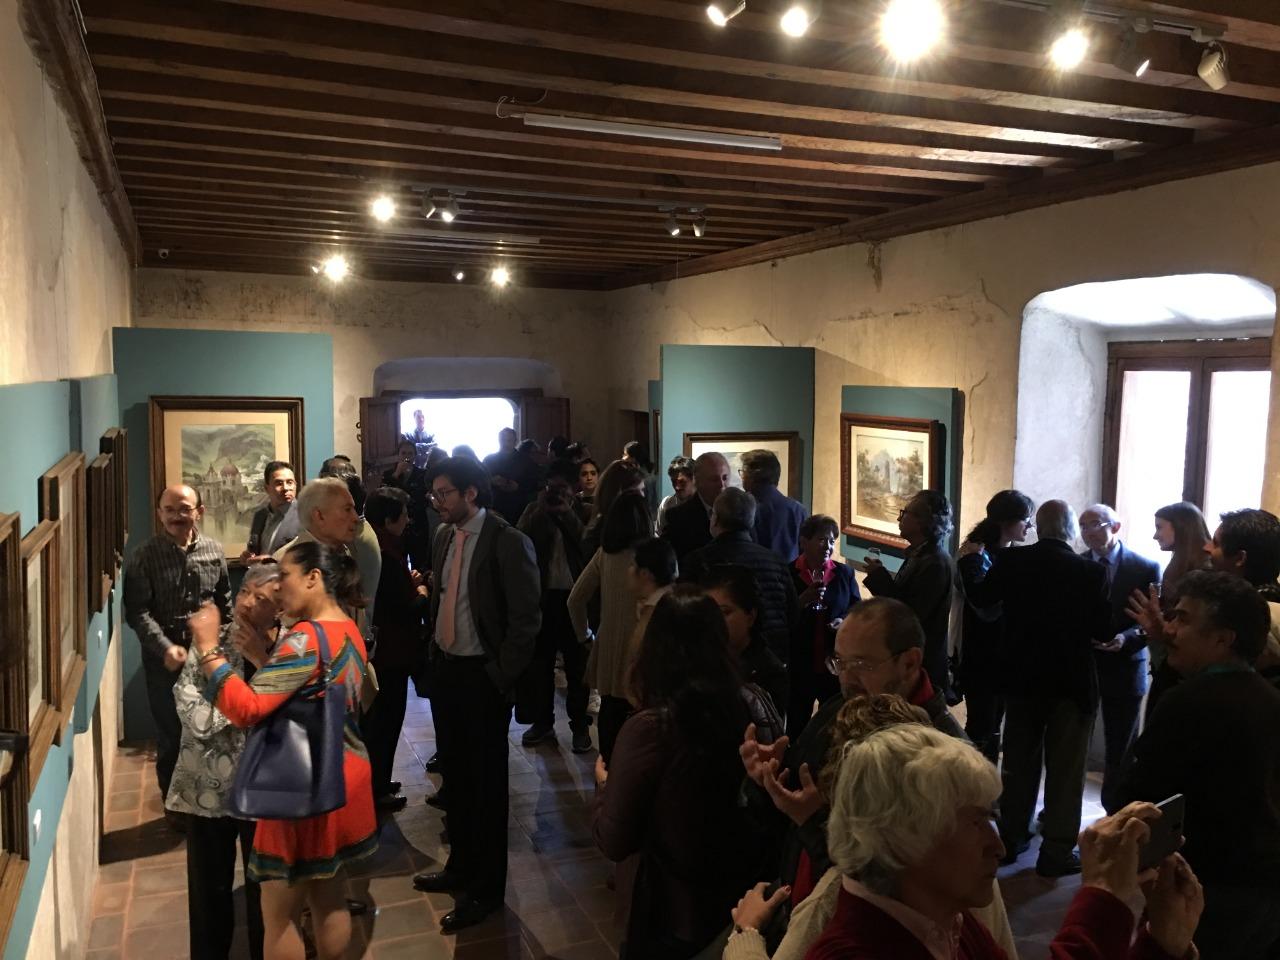 Presenta museo virreinal exposición del artista plástico Edgardo Coghlan